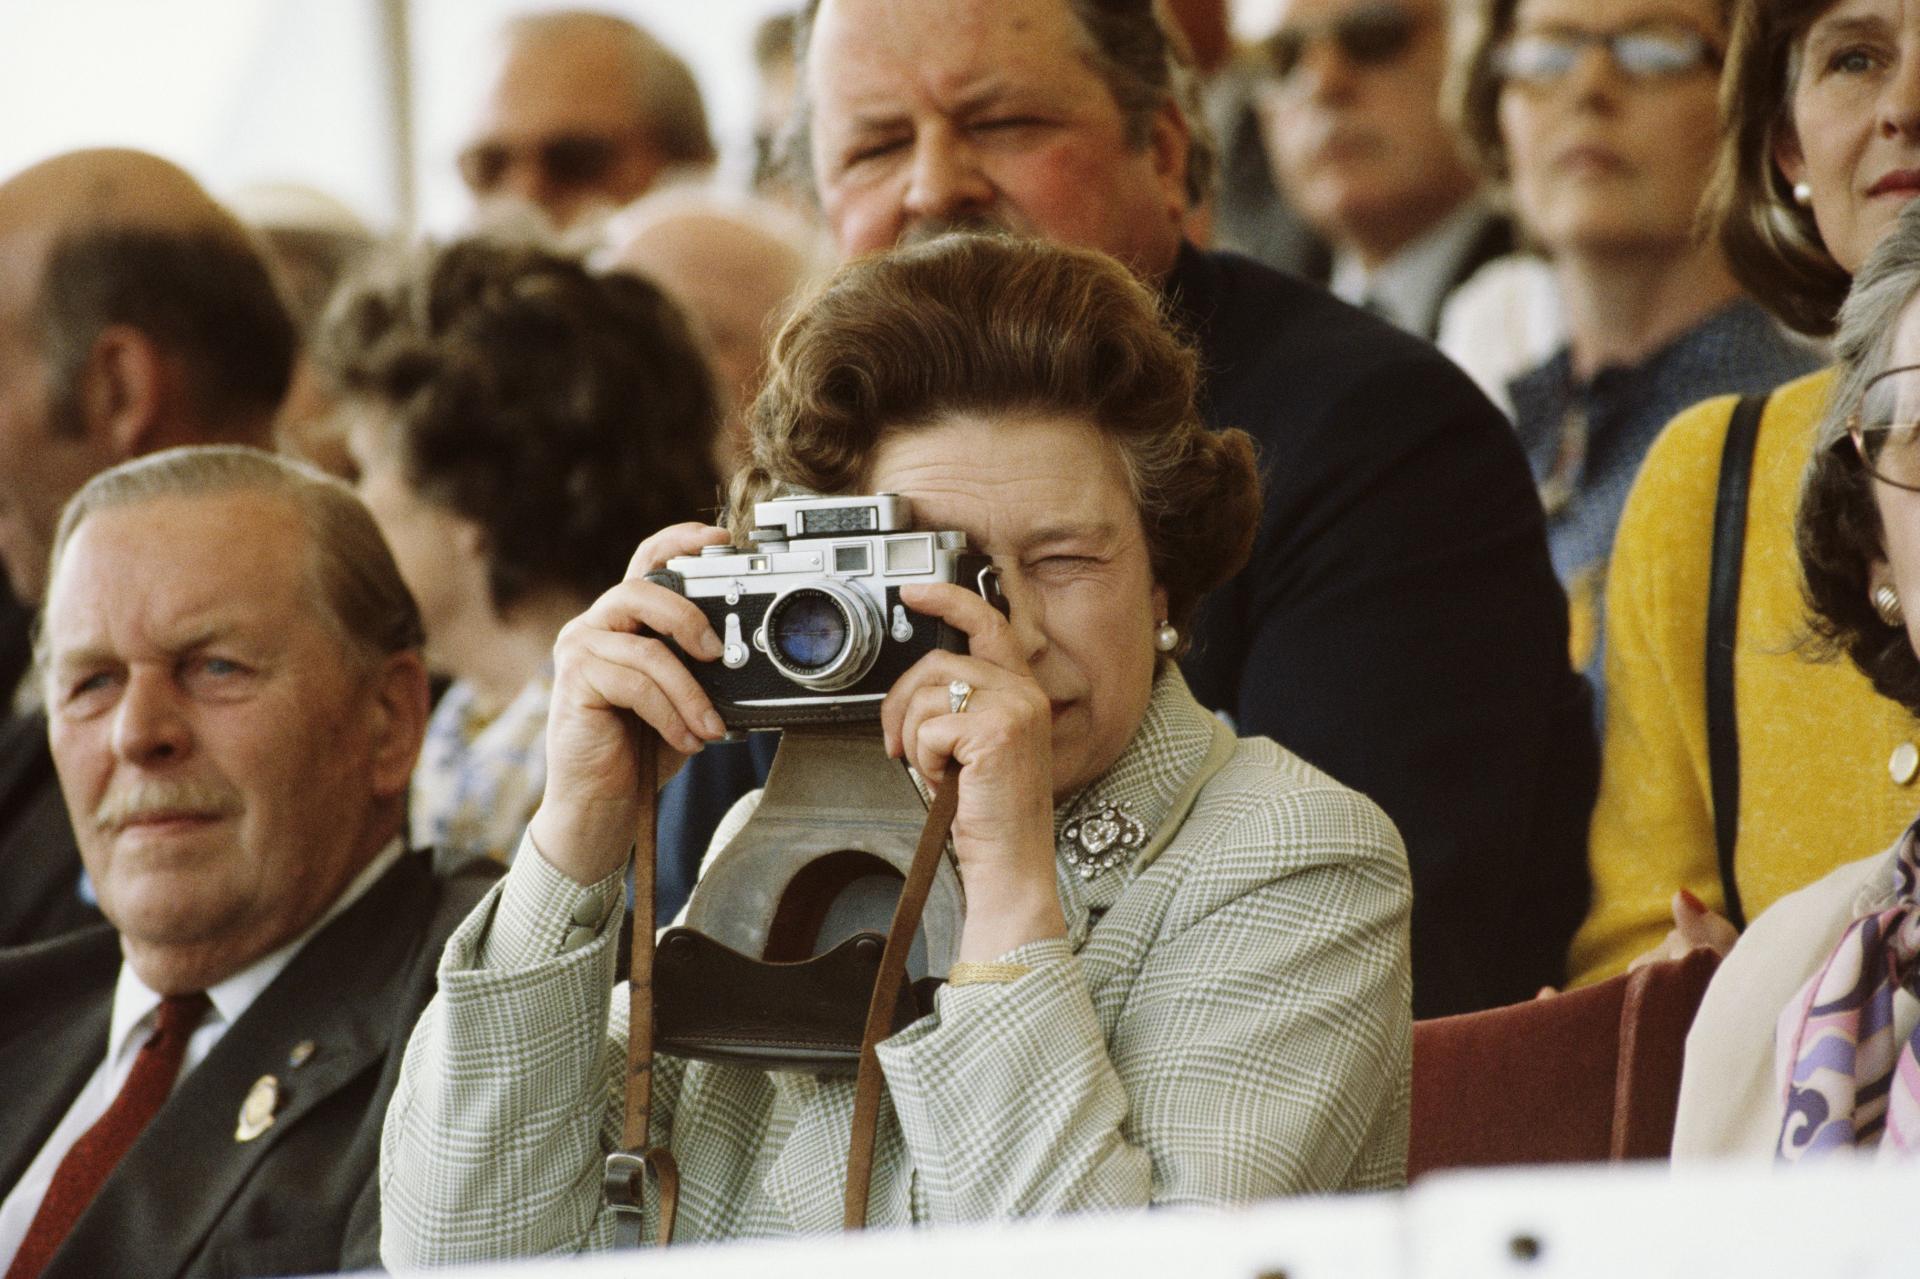 Hbz queen elizabeth national photo day 1982 gettyimages 141768238